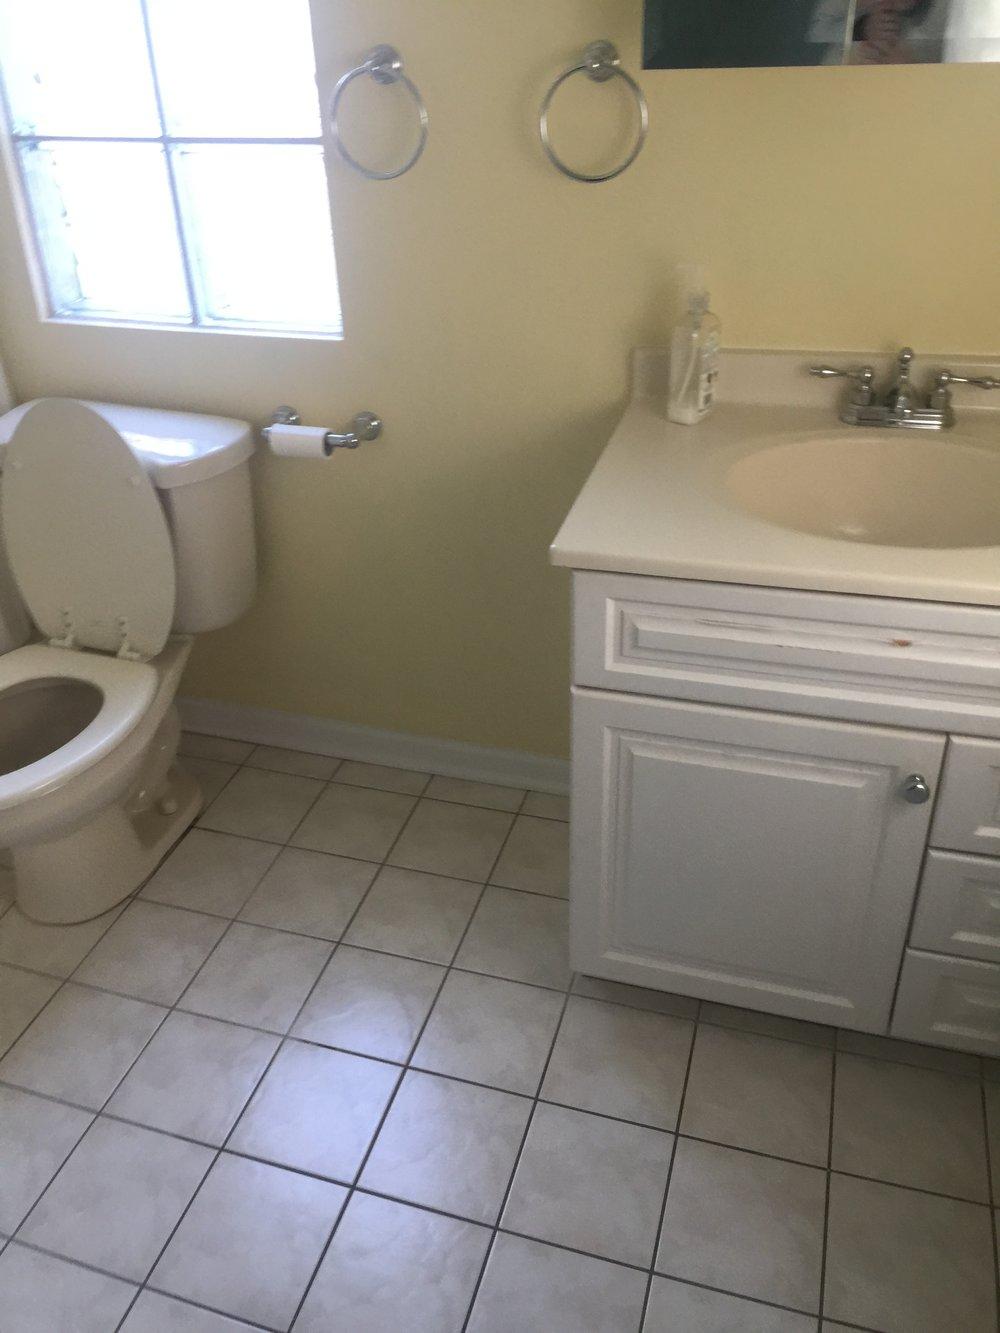 The old hall bathroom.